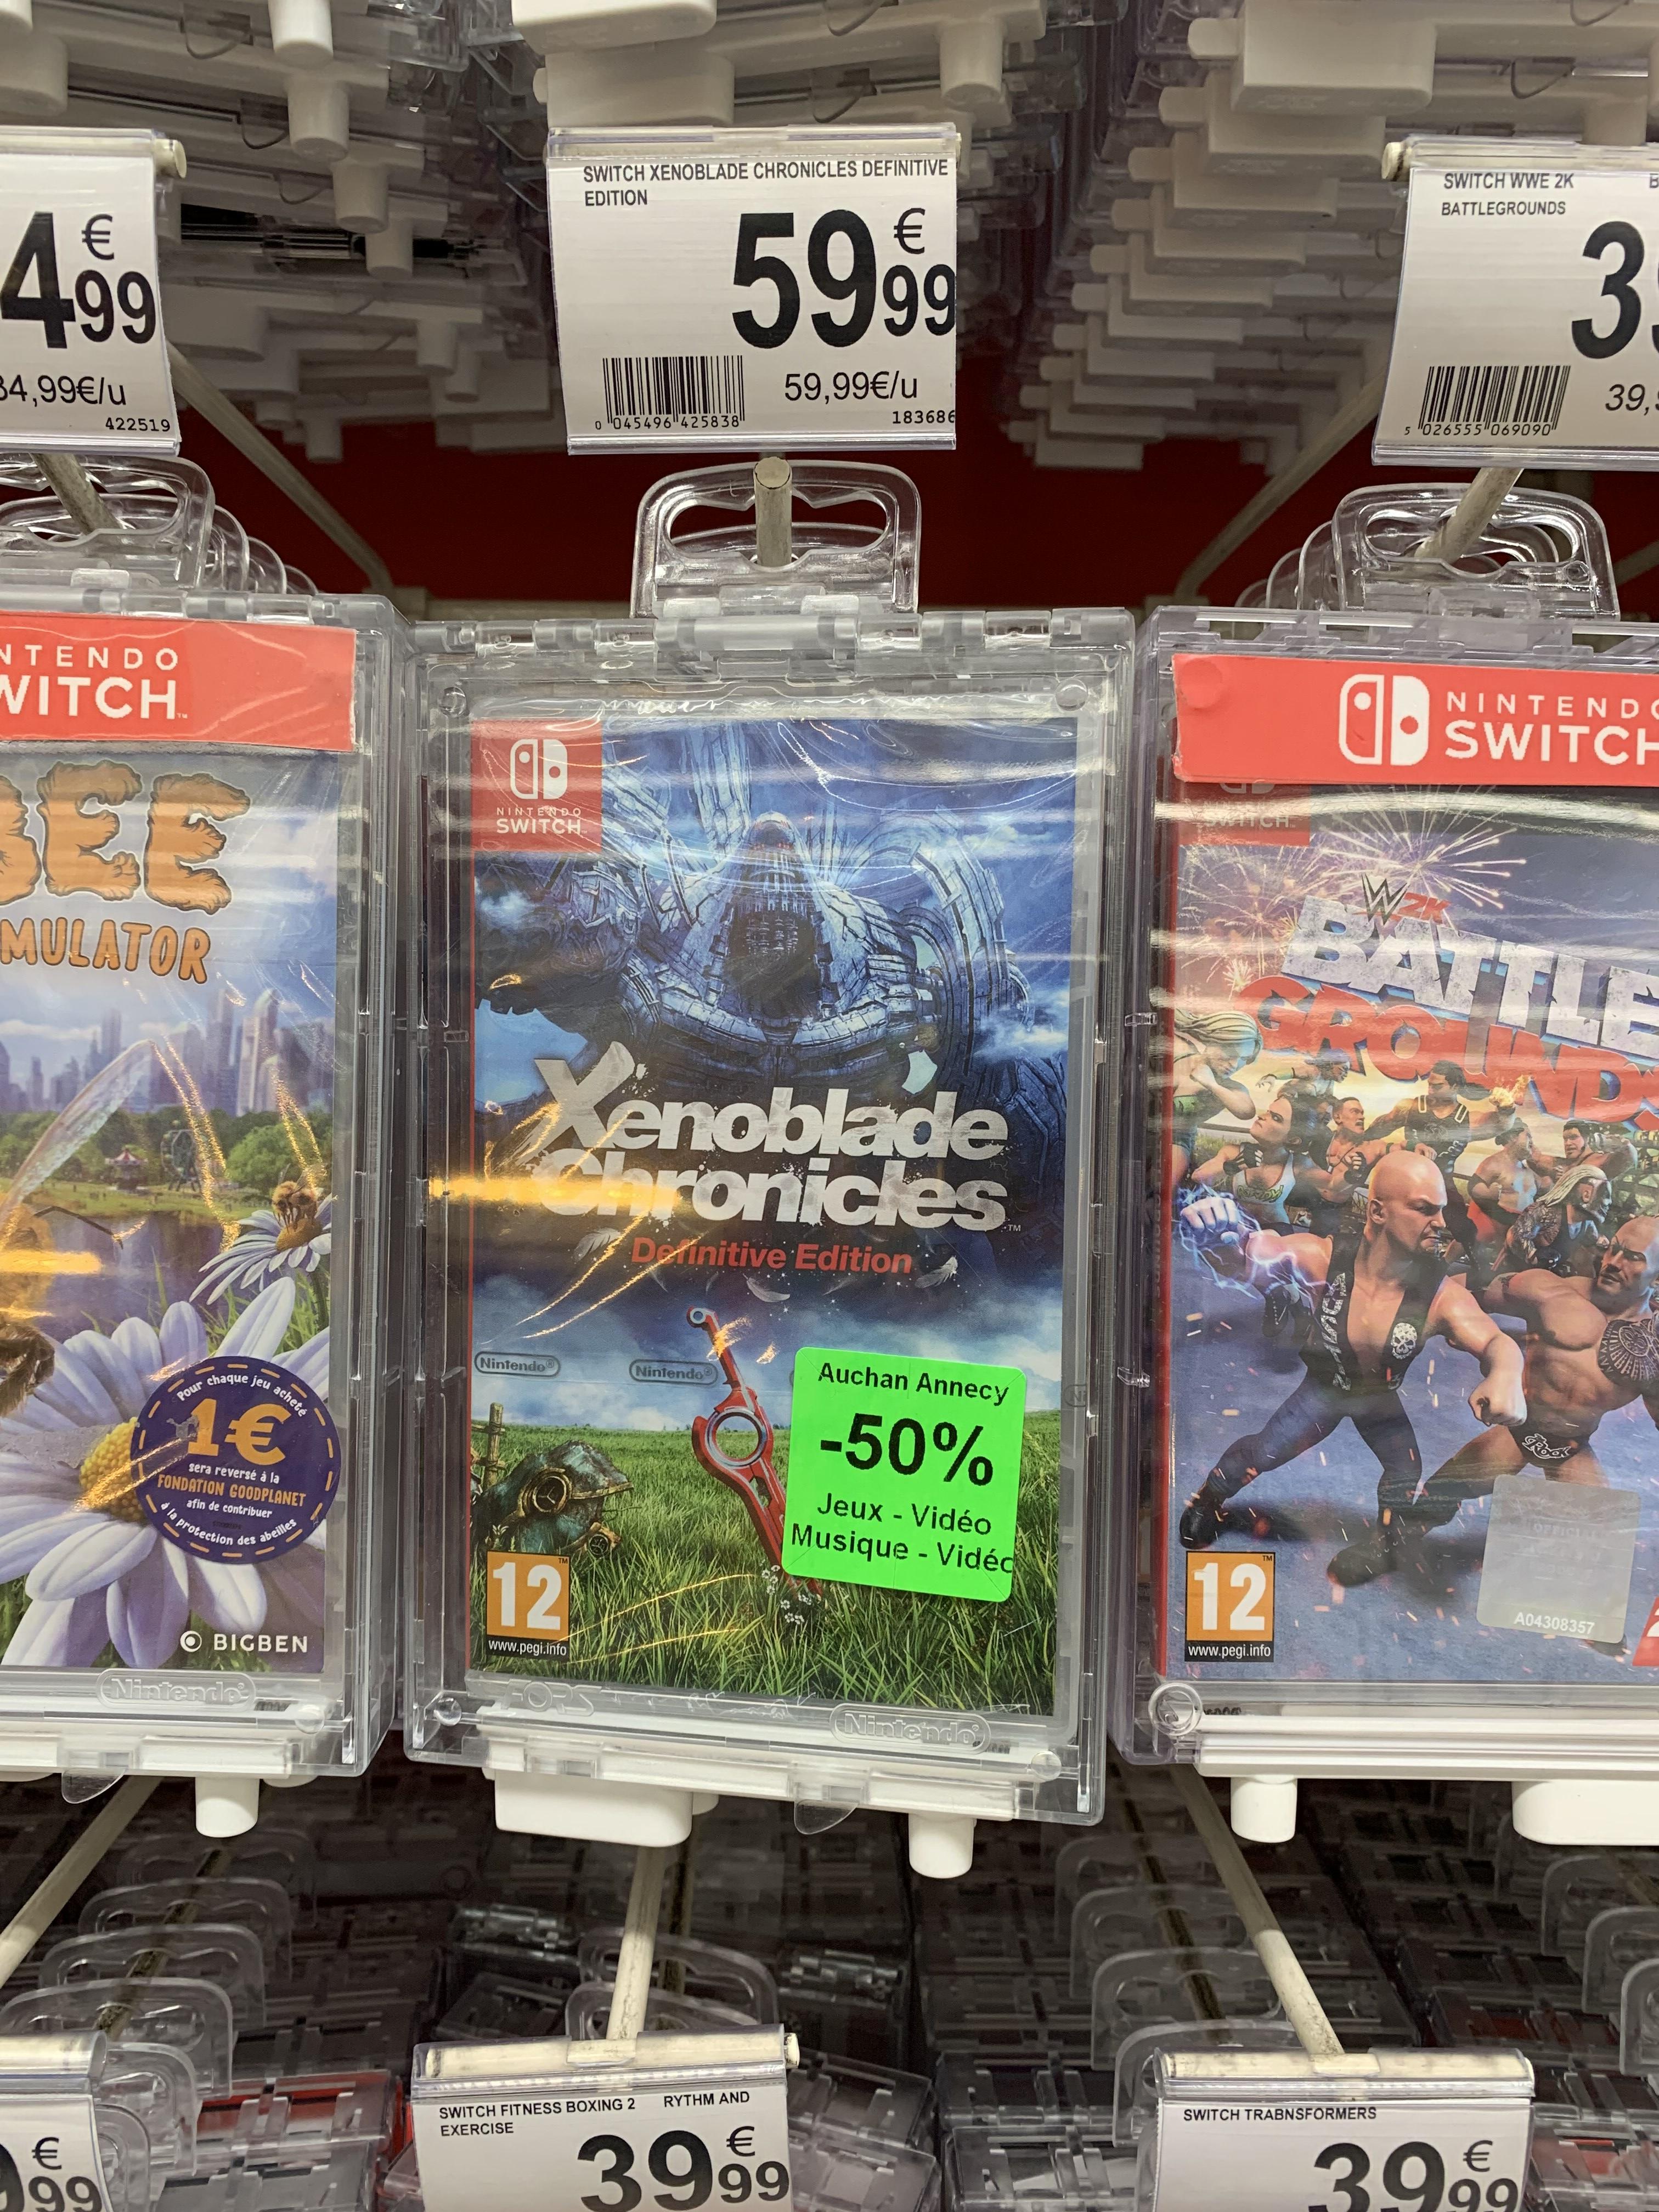 Xenoblade Chronicles Definitive Edition sur Nintendo Switch (Epagny 74)